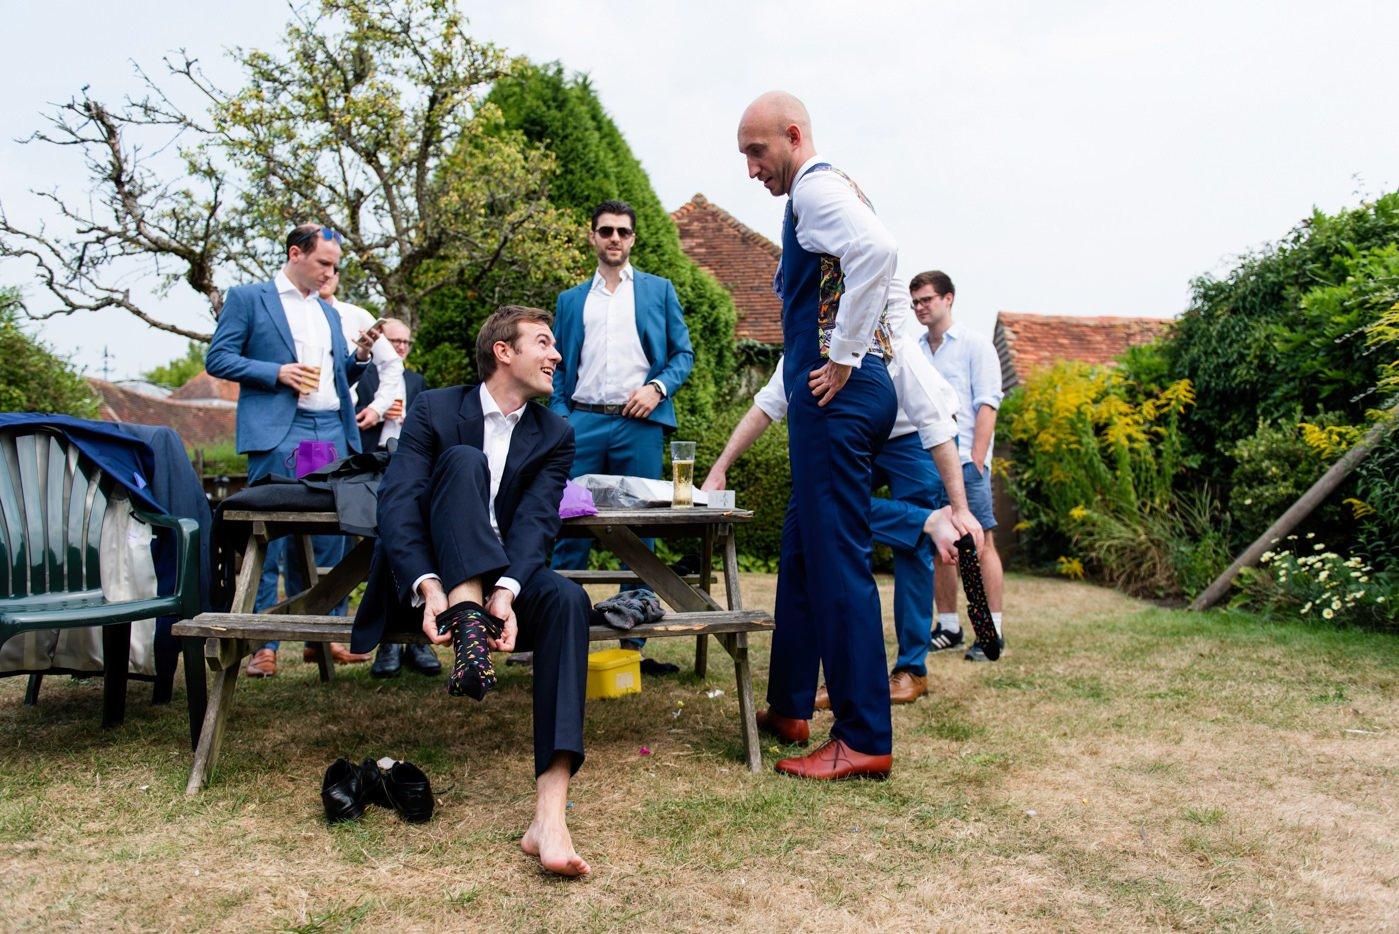 bignor-park-wedding-photography-robyn-and-tom-18